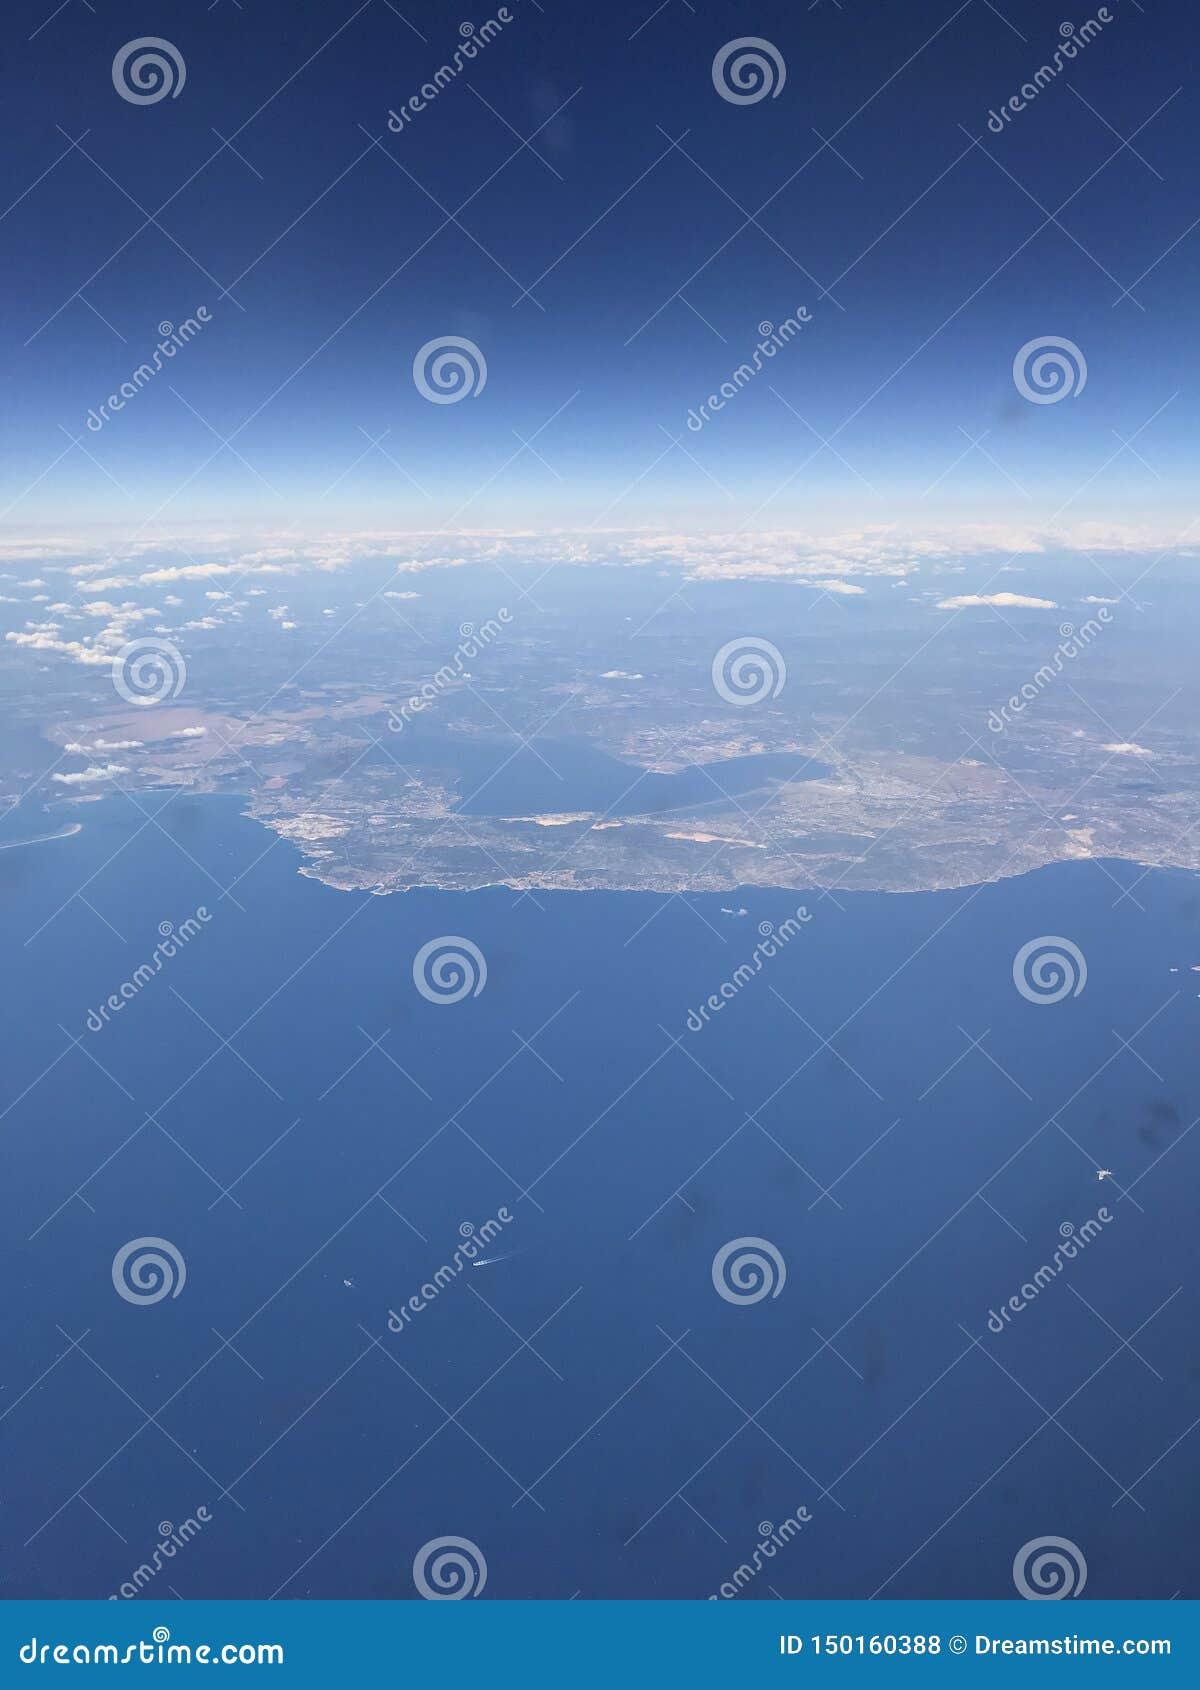 R 巴塞罗那,天空蔚蓝,飞行